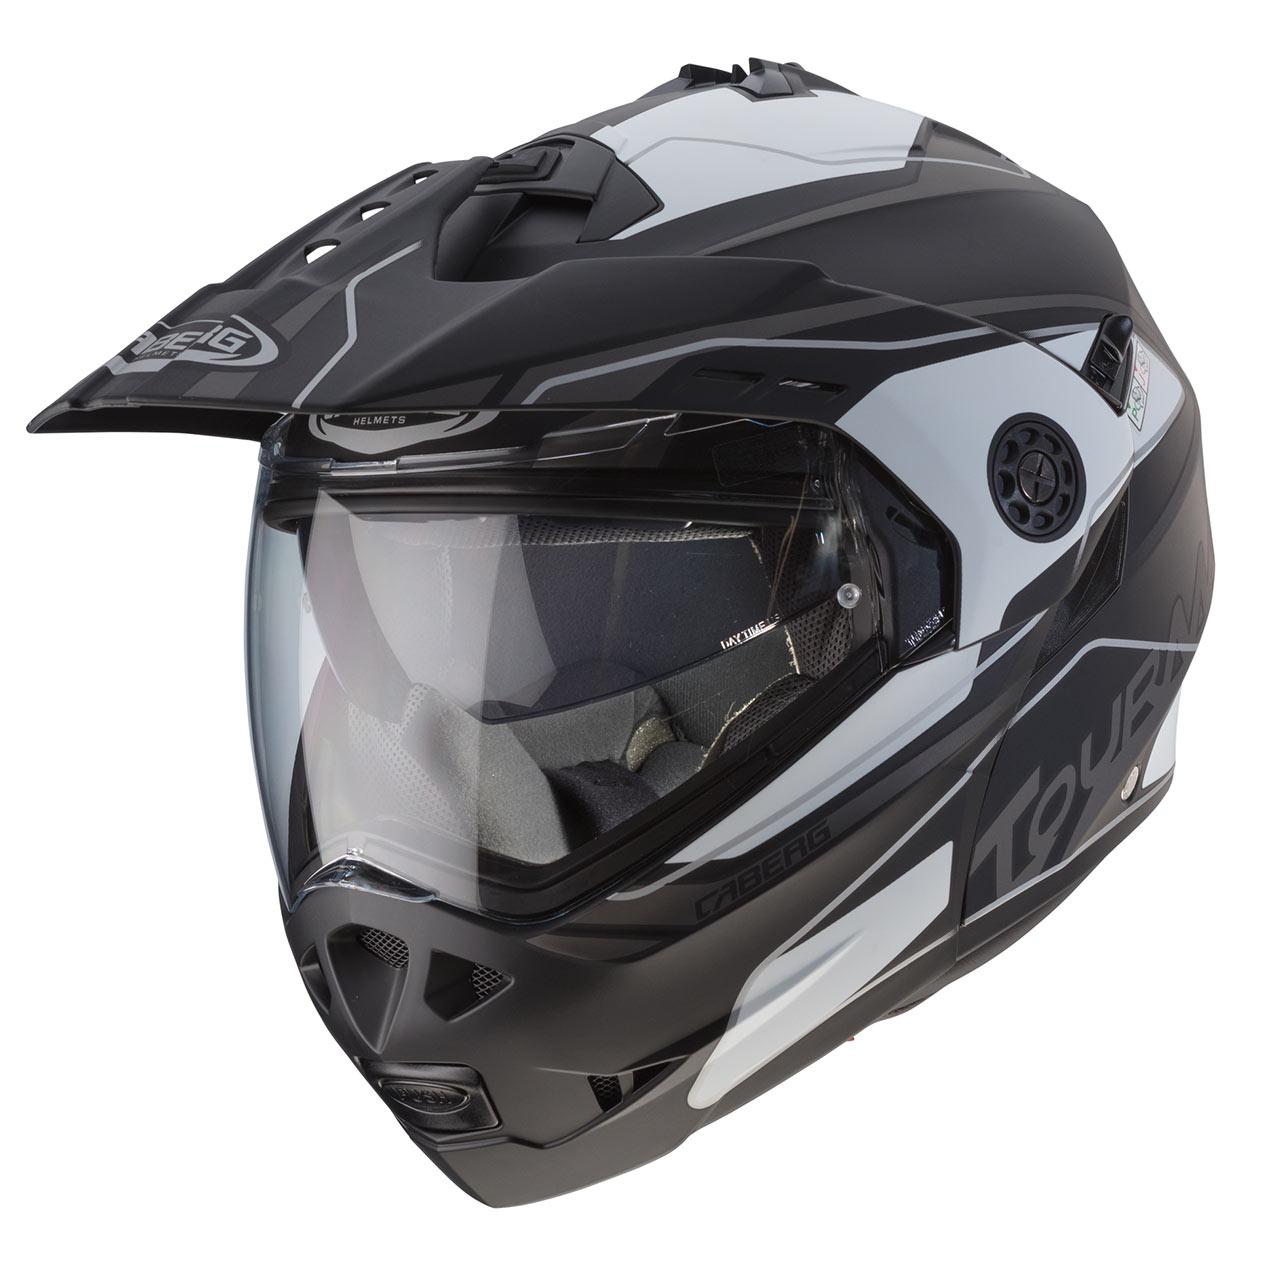 55685539 Flip-up/modular helmet Caberg TOURMAX